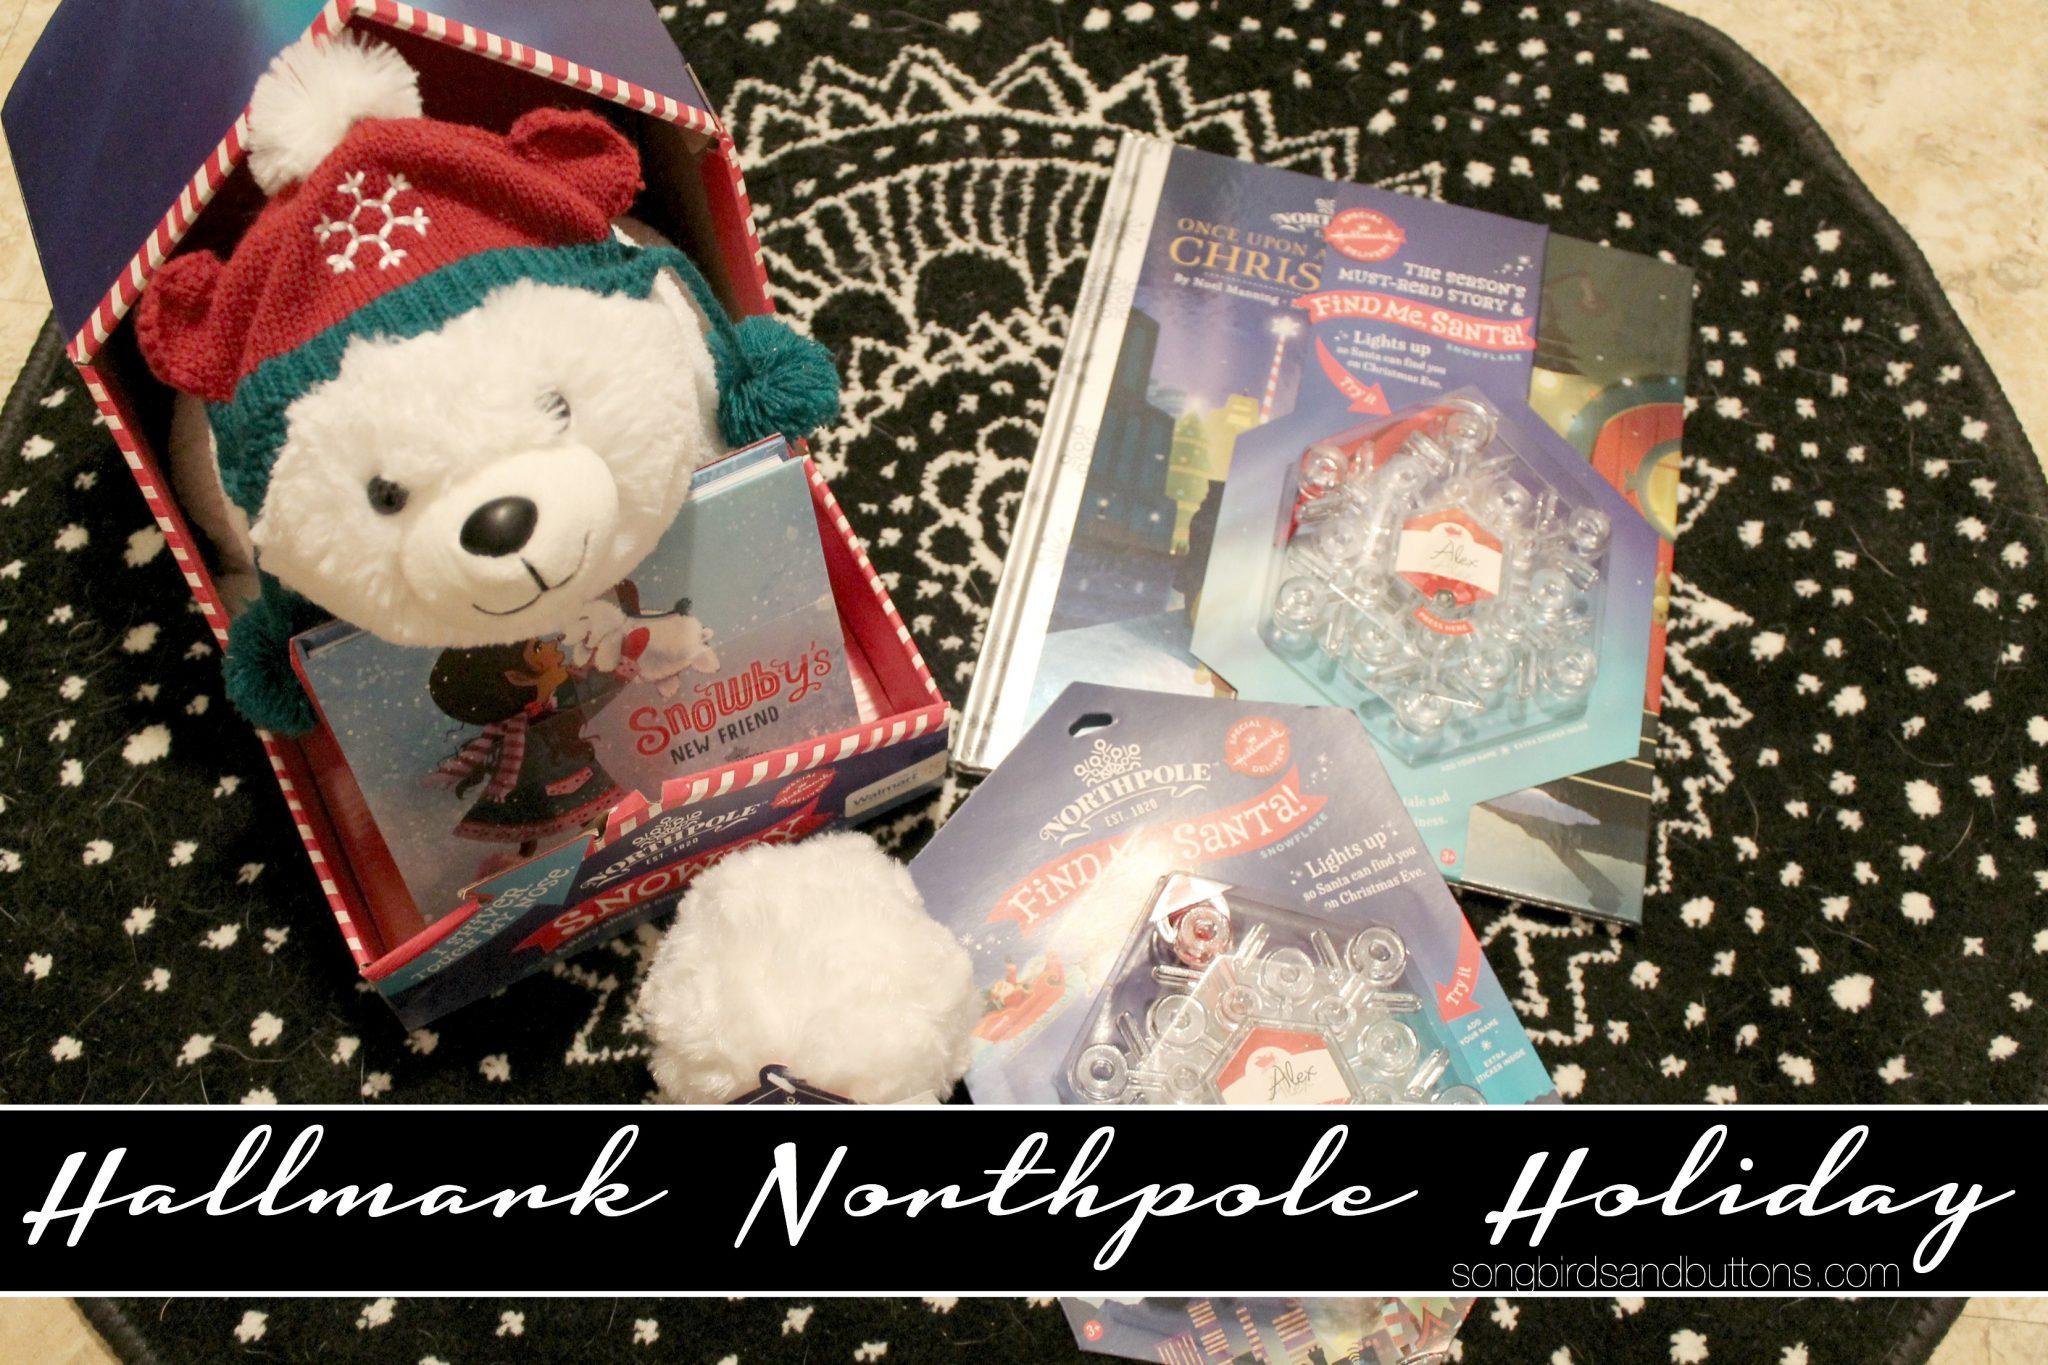 Hallmark Northpole Holiday